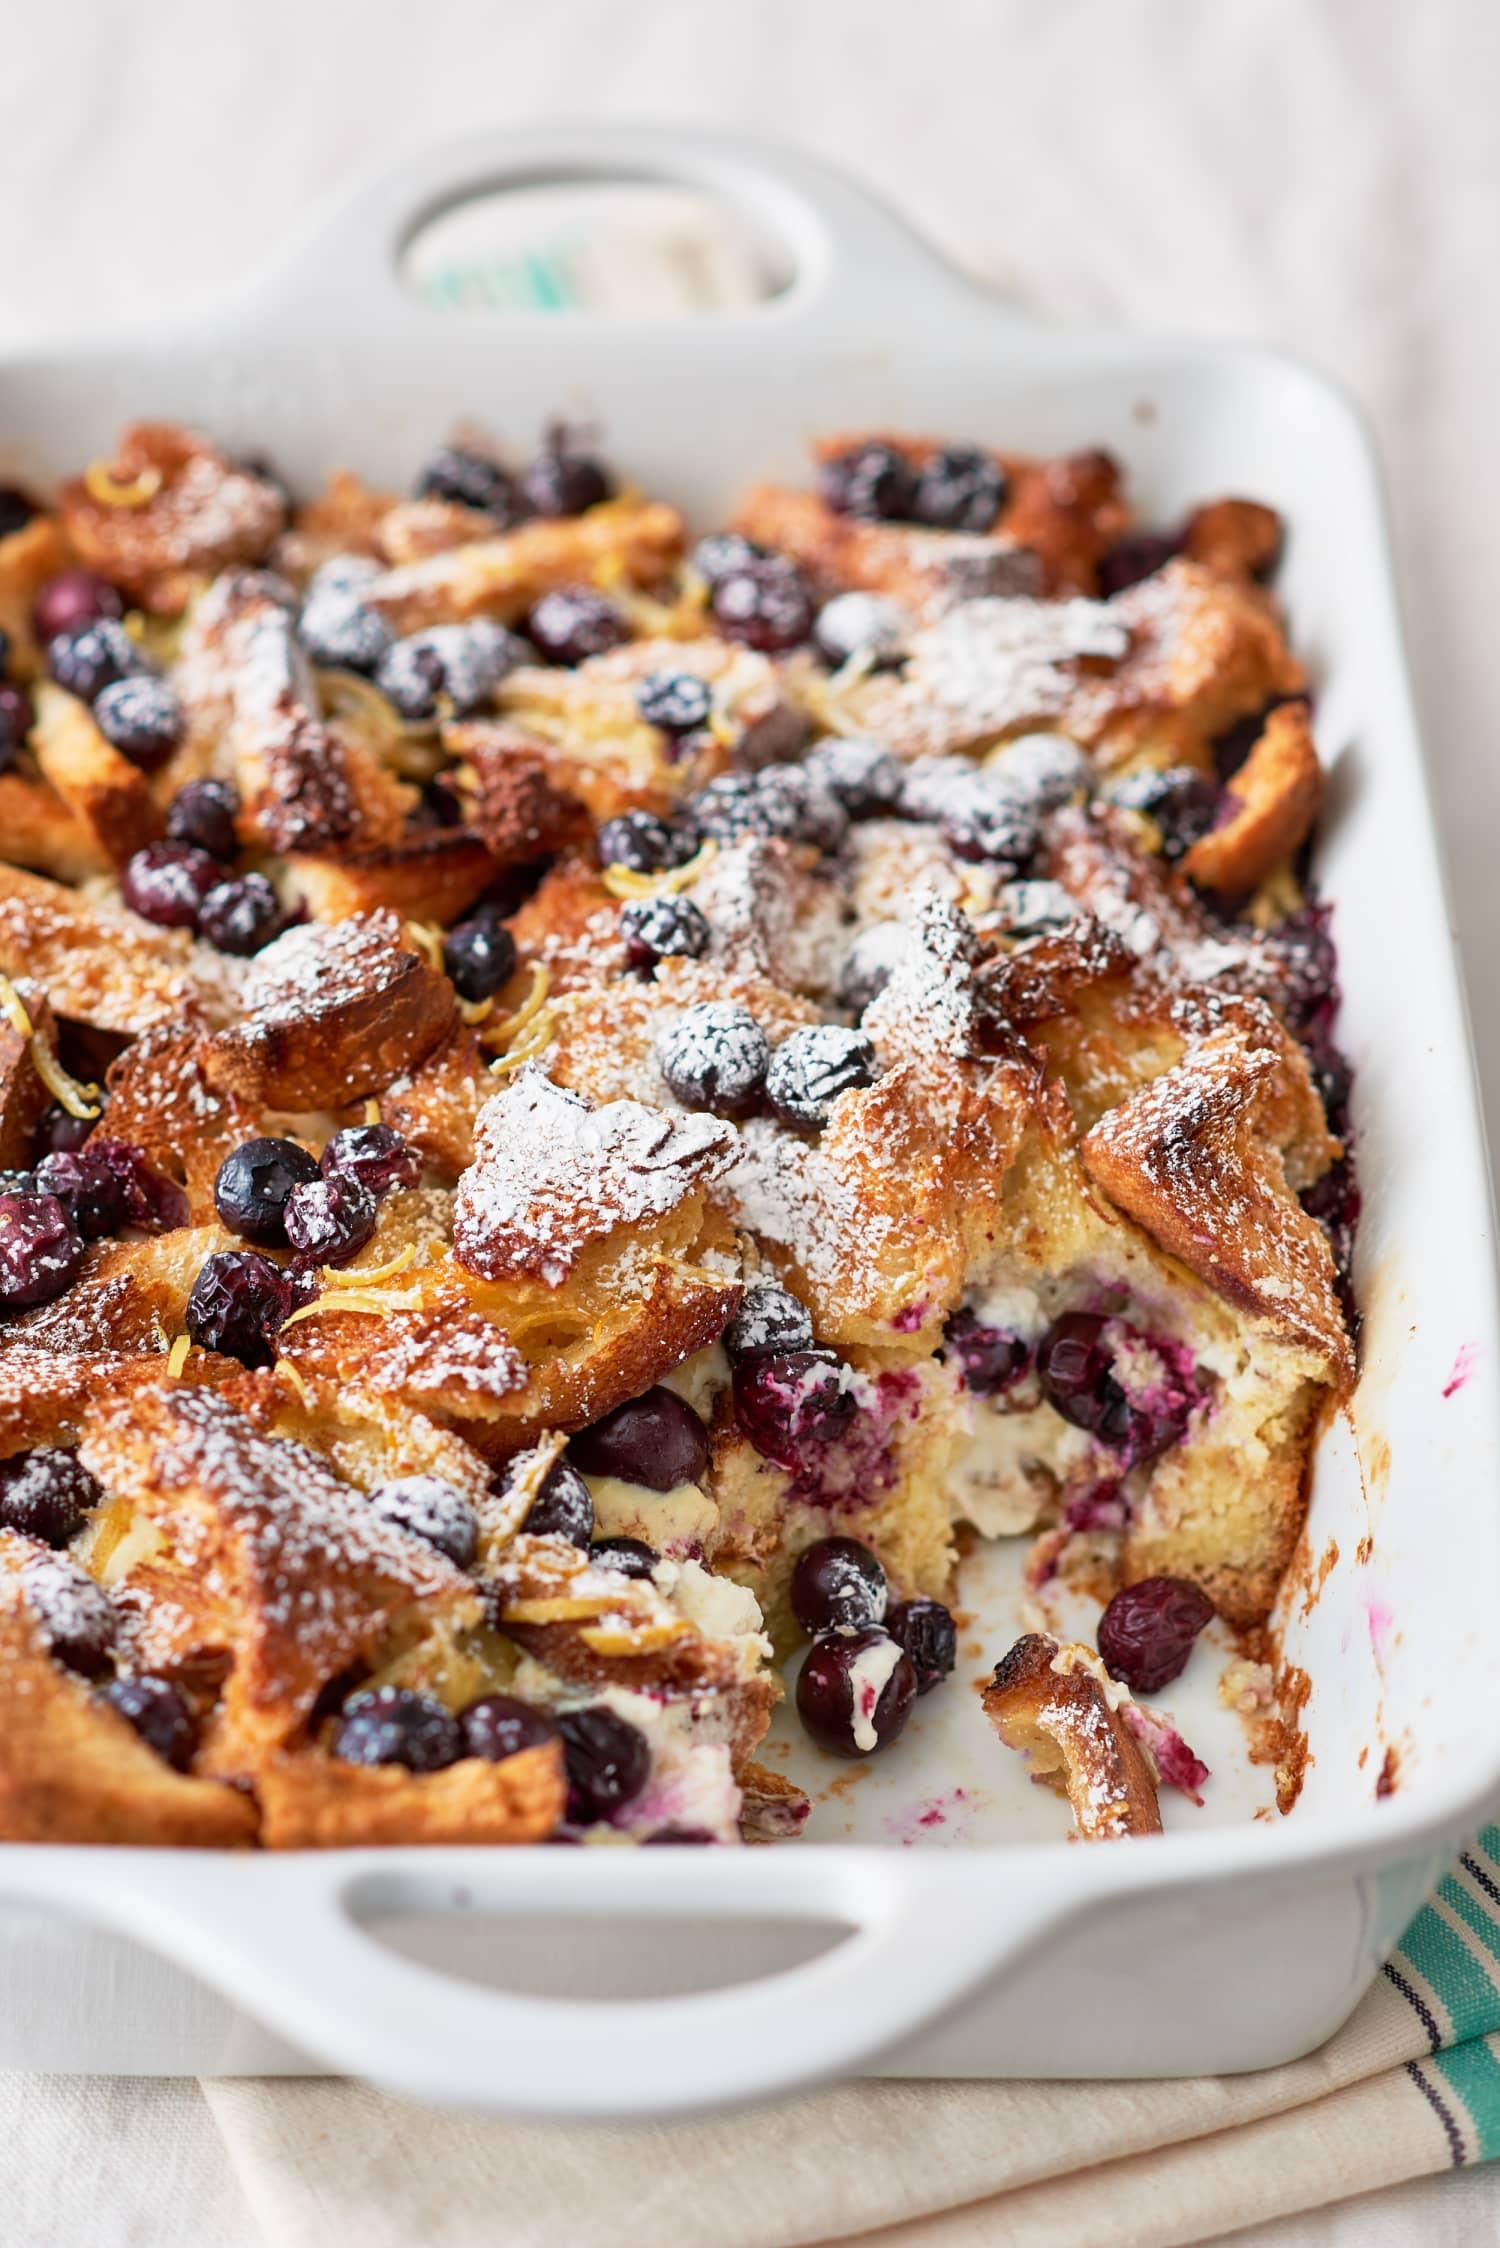 Recipe: Blueberry Cheesecake Breakfast Bake